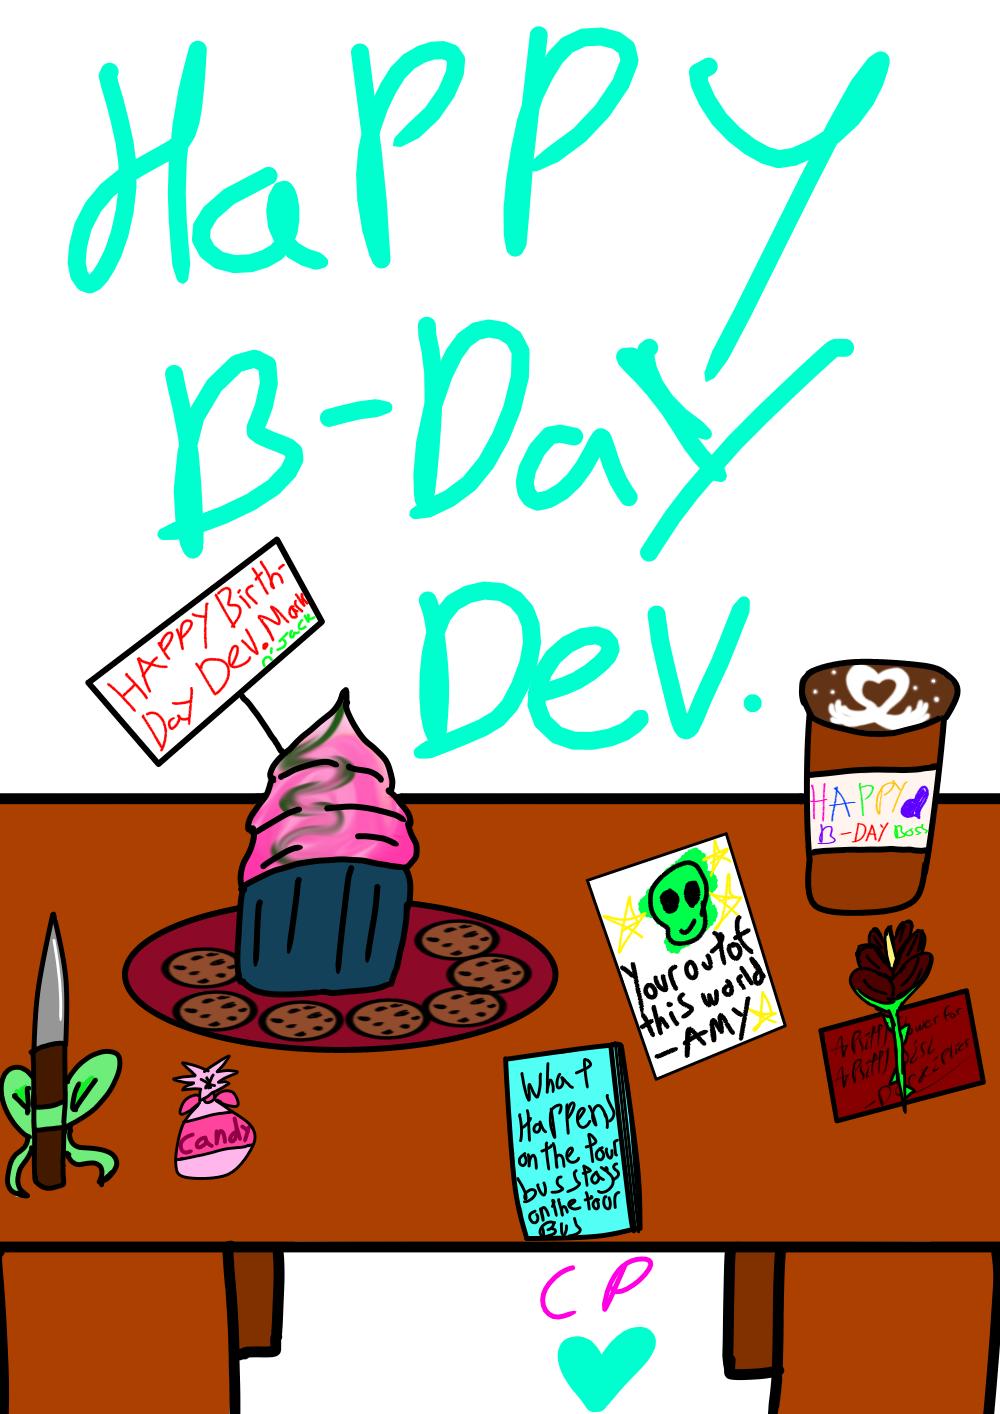 Happy (late) BIRTHDAY BOSS! by Cutsiepi